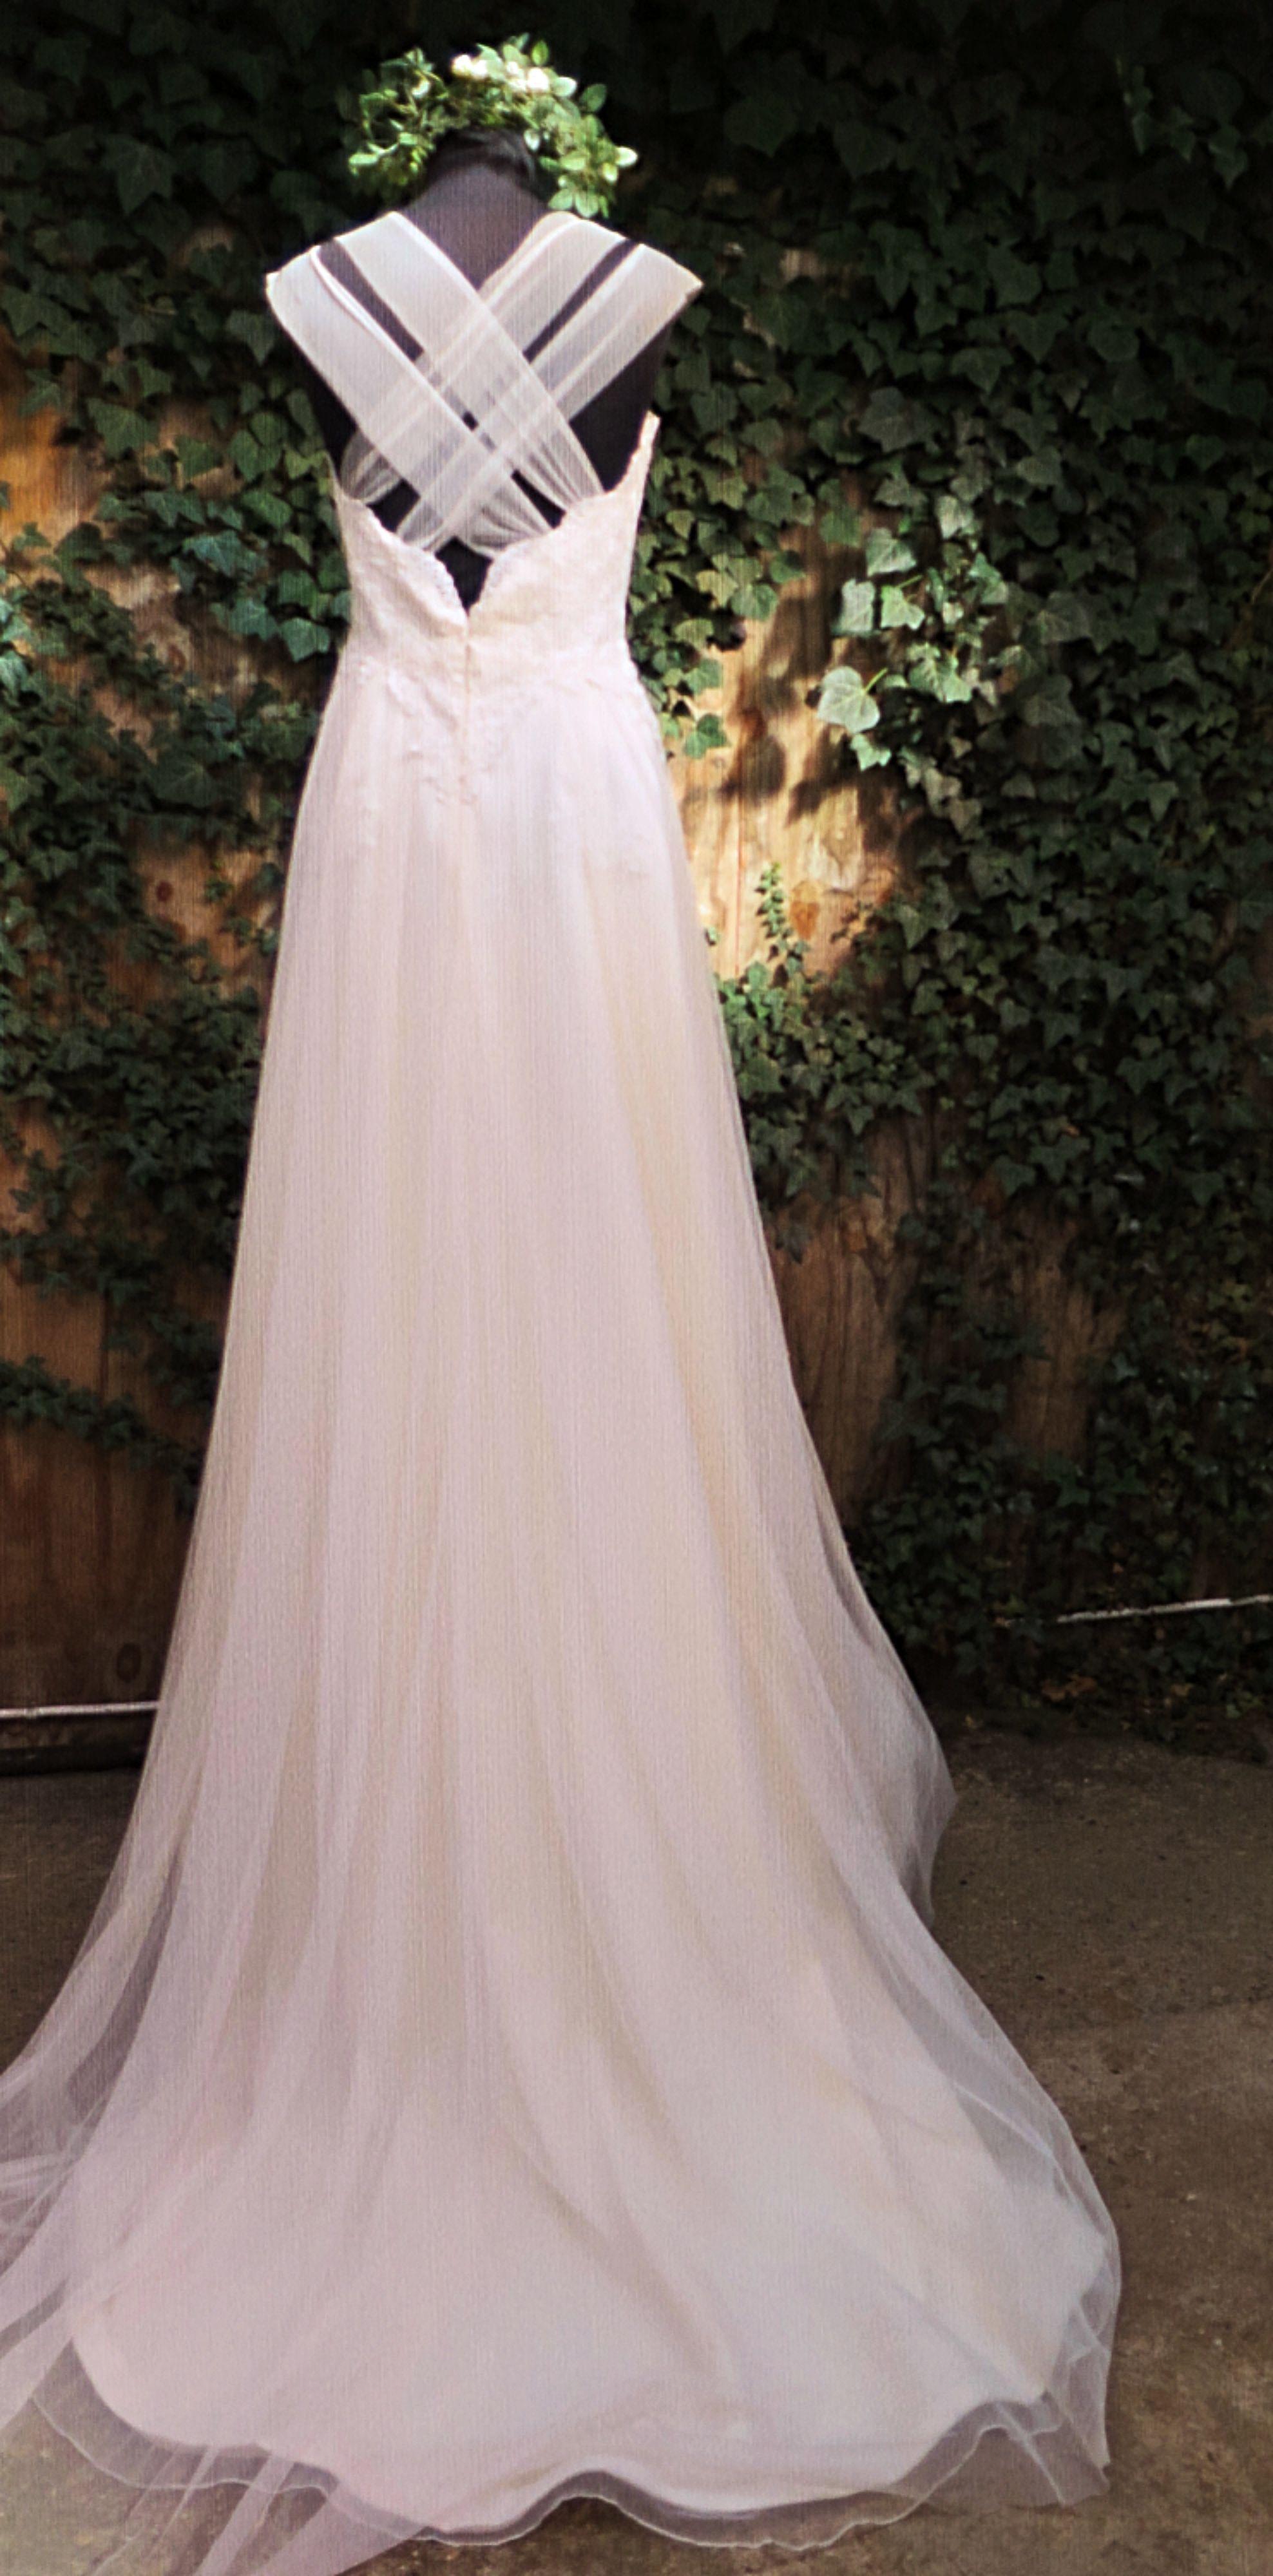 Hayley paige dori wedding dress  Adair back imageBlush by Hayley Paige lavenderandjude  Blush by